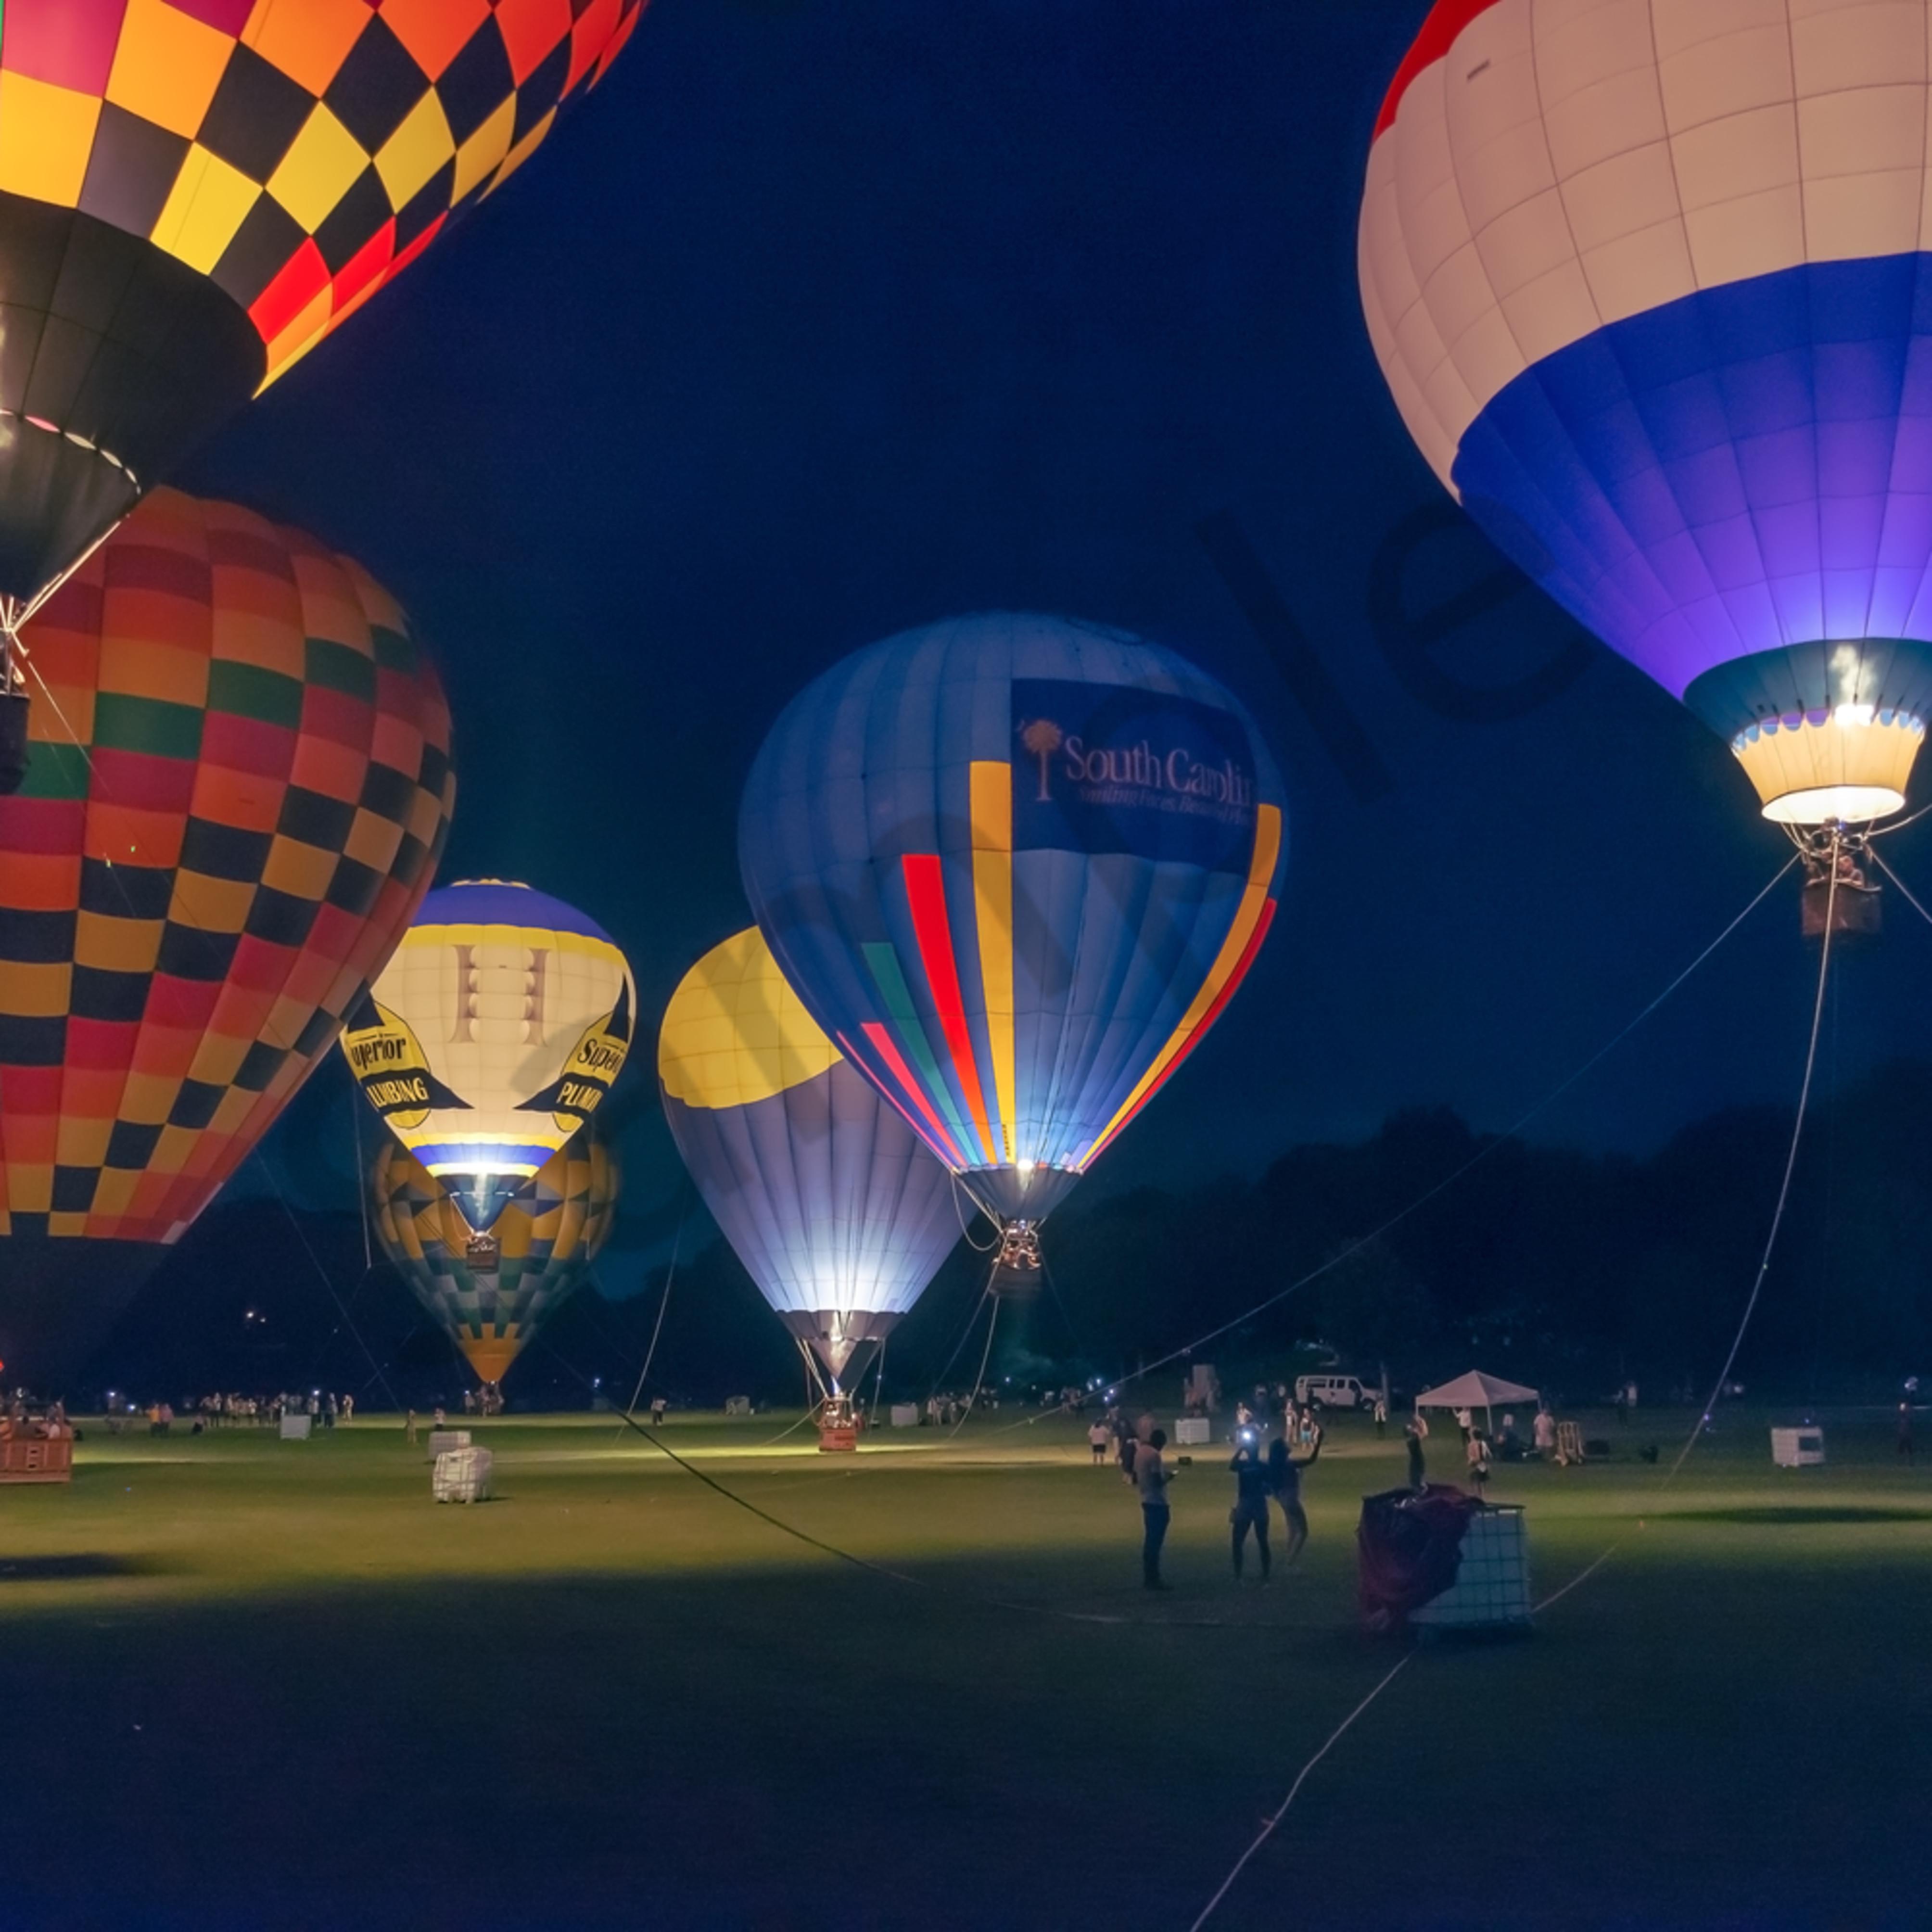 Piedmont park hot air balloon glow v5a1w4